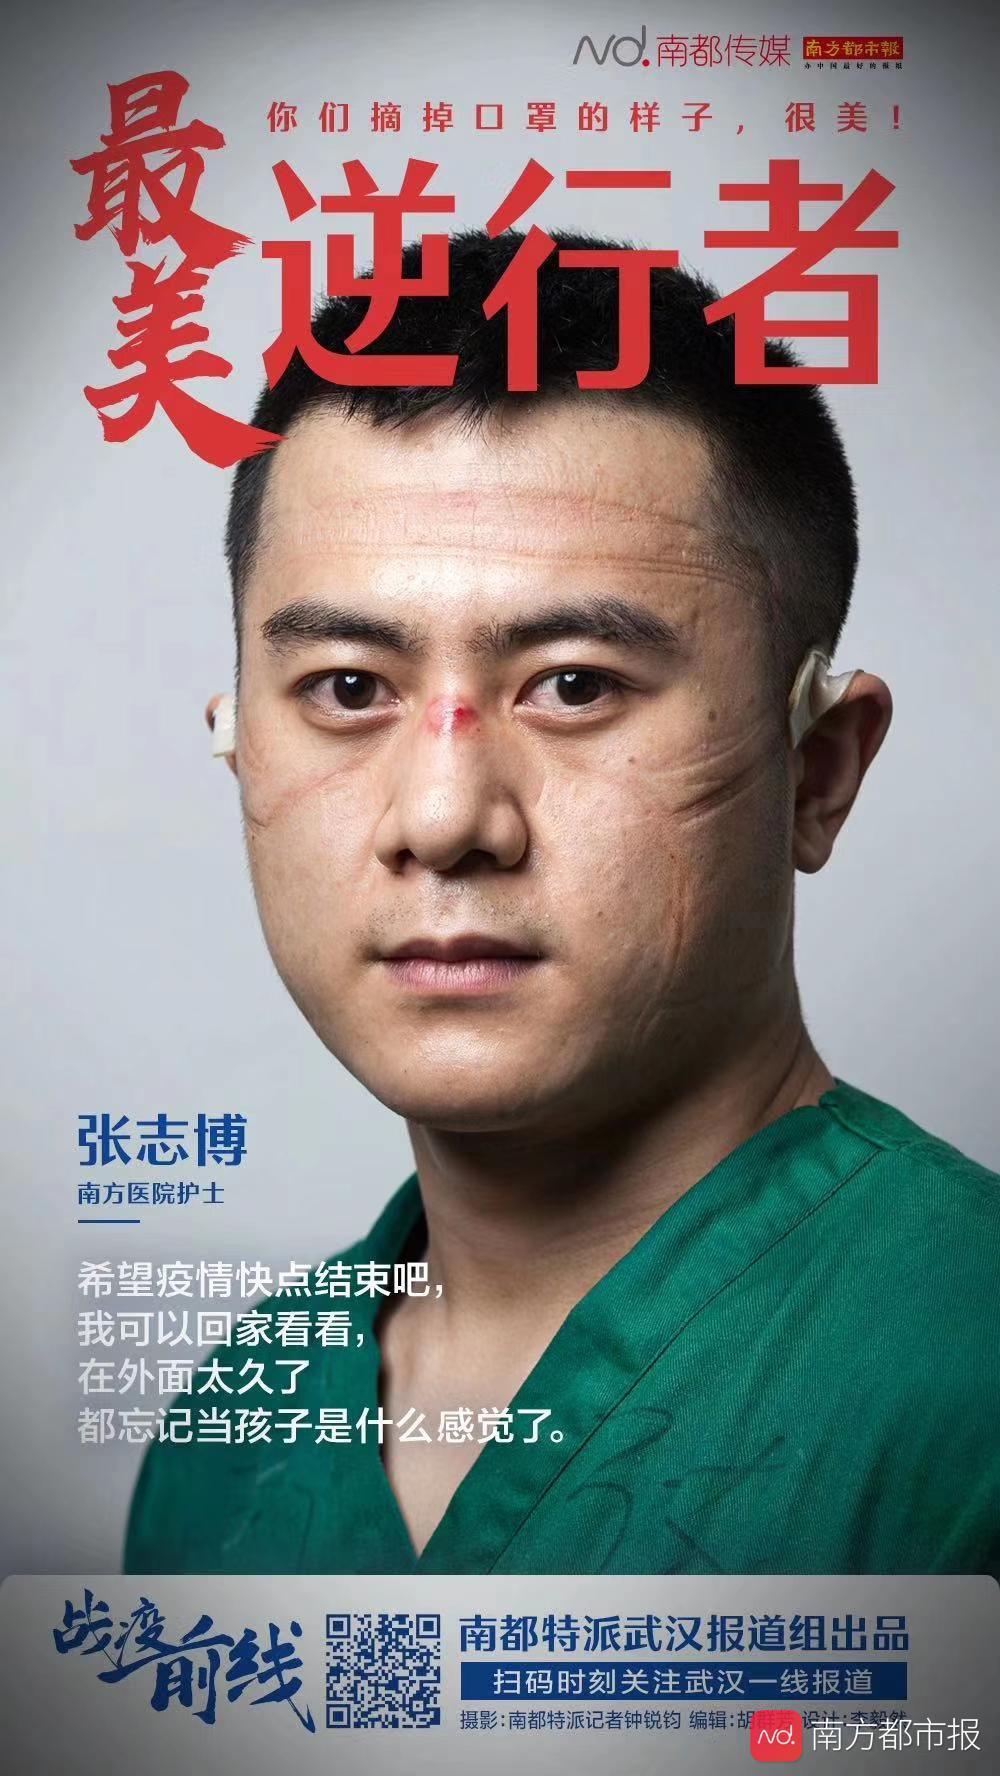 http://www.edaojz.cn/qichexingye/477133.html